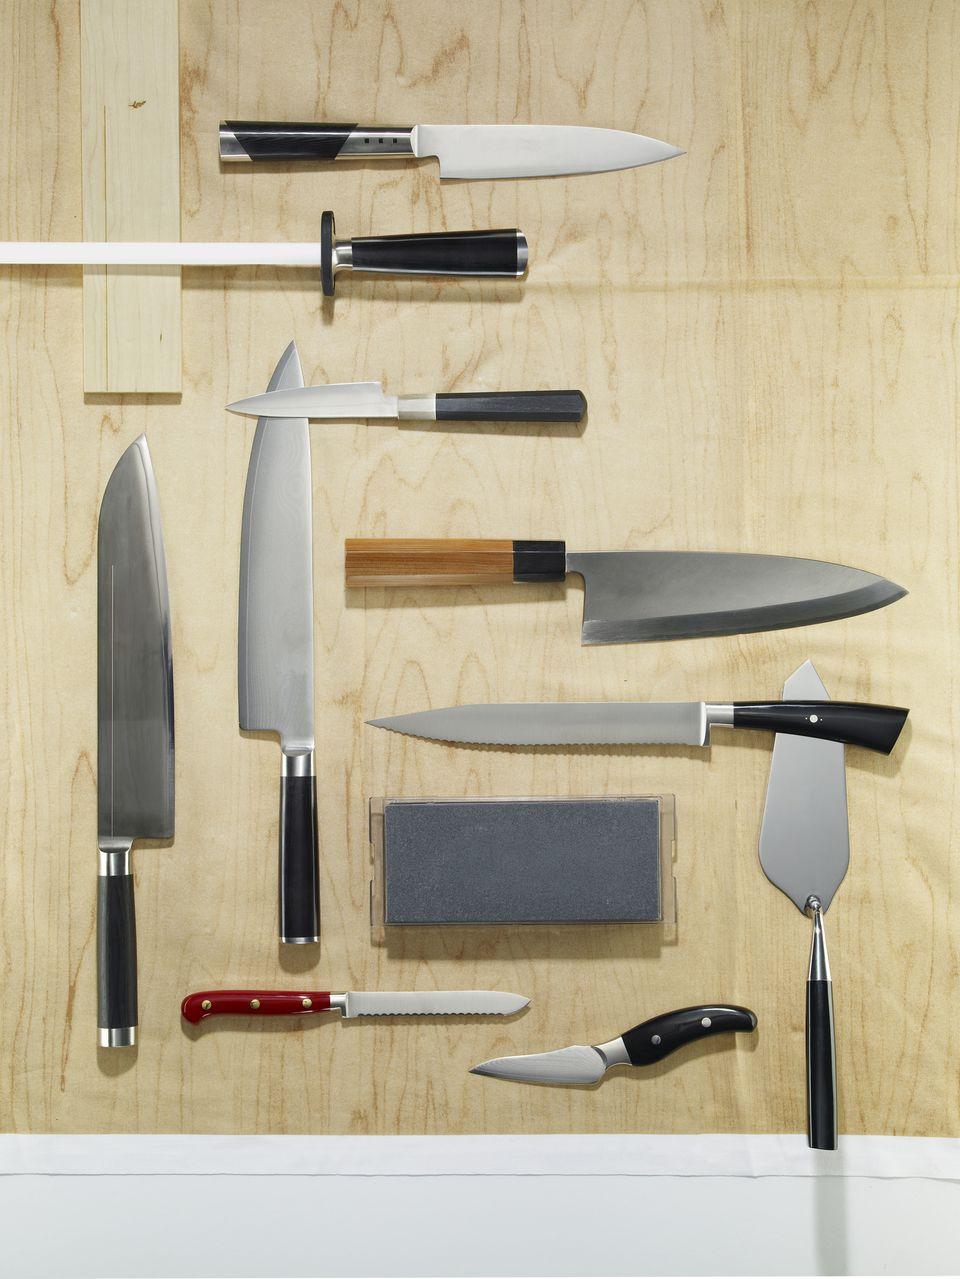 Knife grid